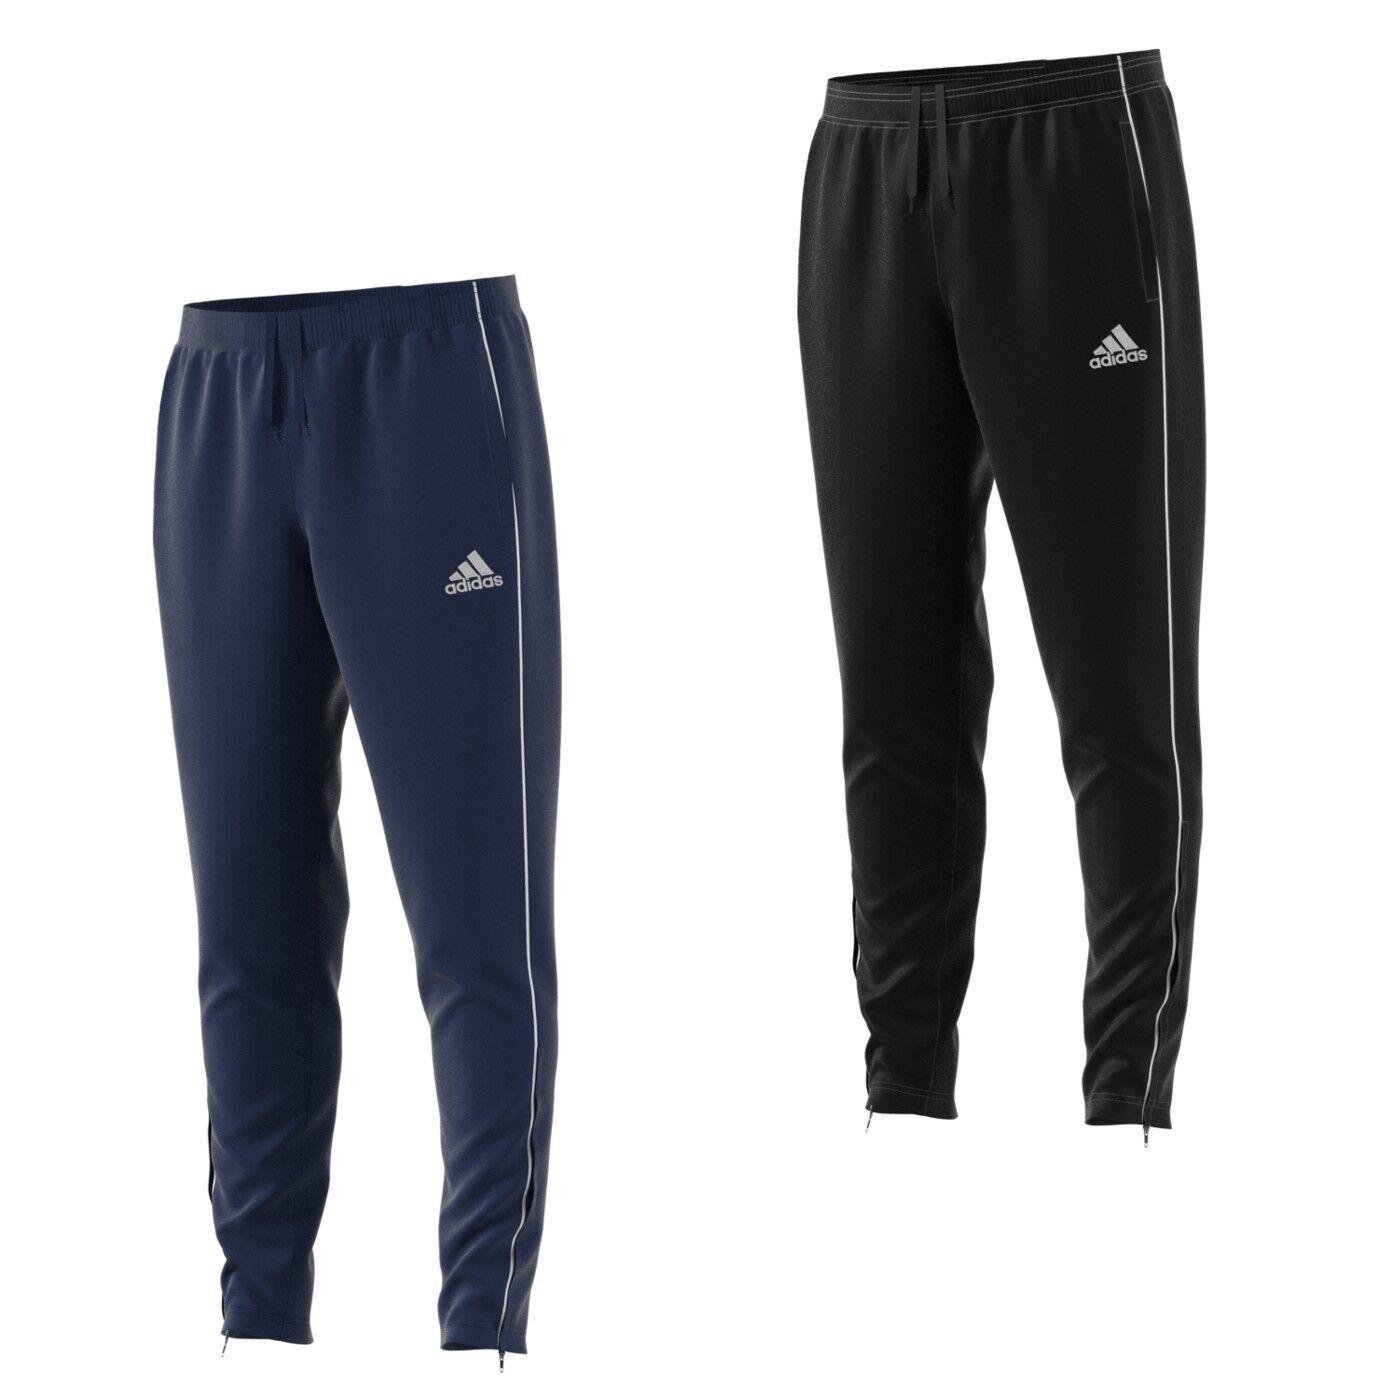 cdfeea7ba1e2d1 Fitness   Jogging adidas Core 18 Herren Hose Jogginghose Trainingshose Pant  schwarz CE9036 Bekleidung